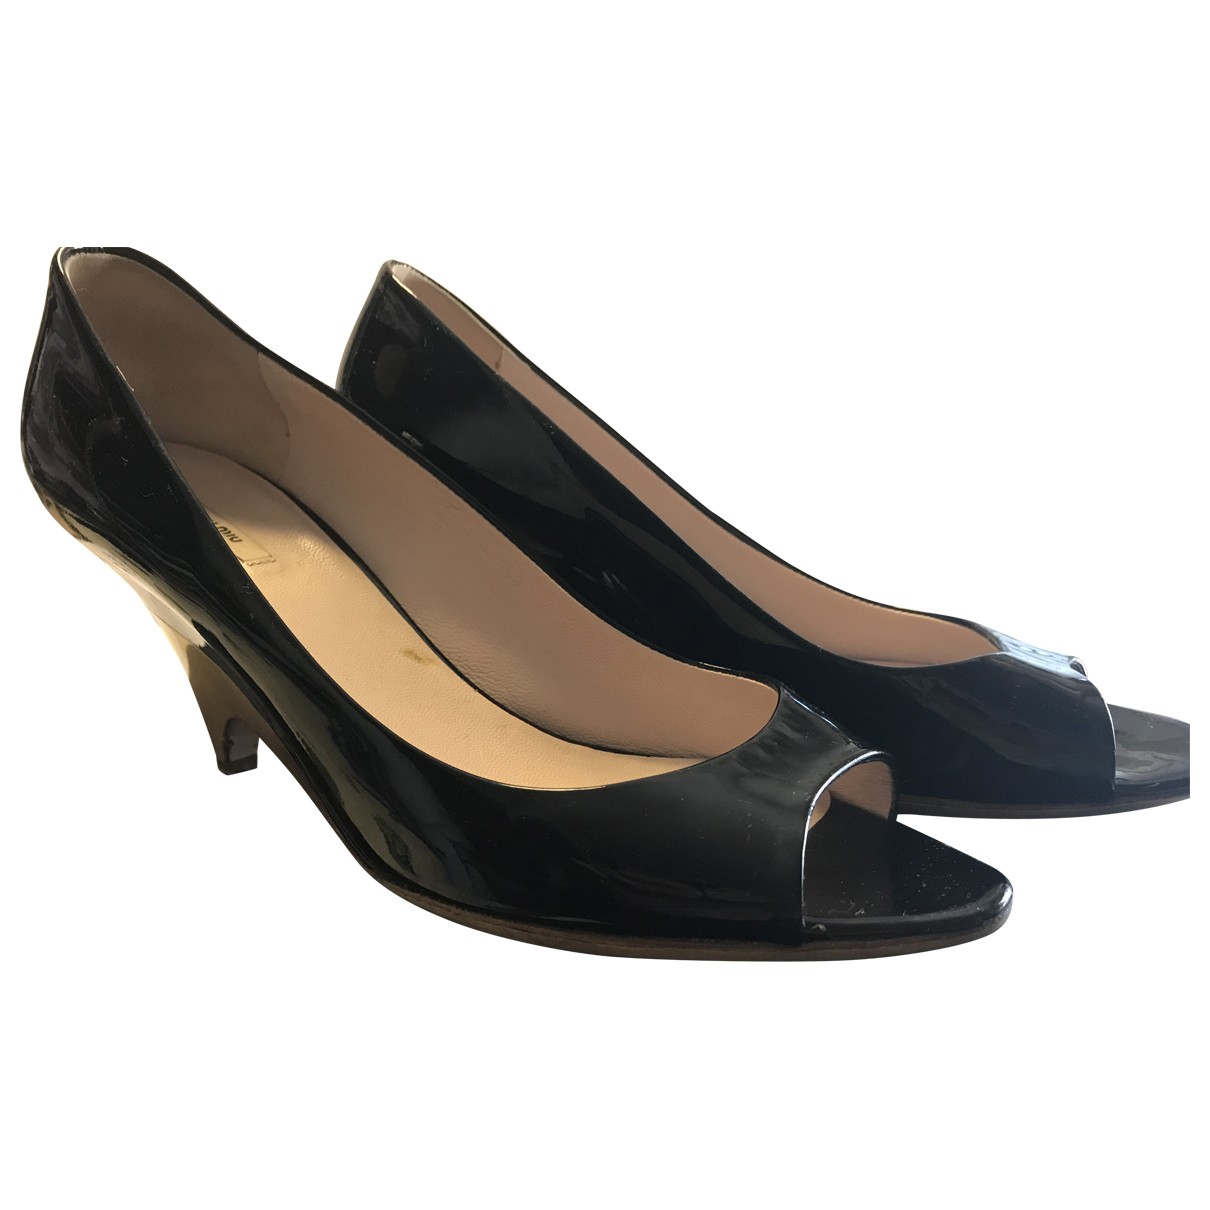 Prada \N Black Patent leather Heels for Women 37 IT